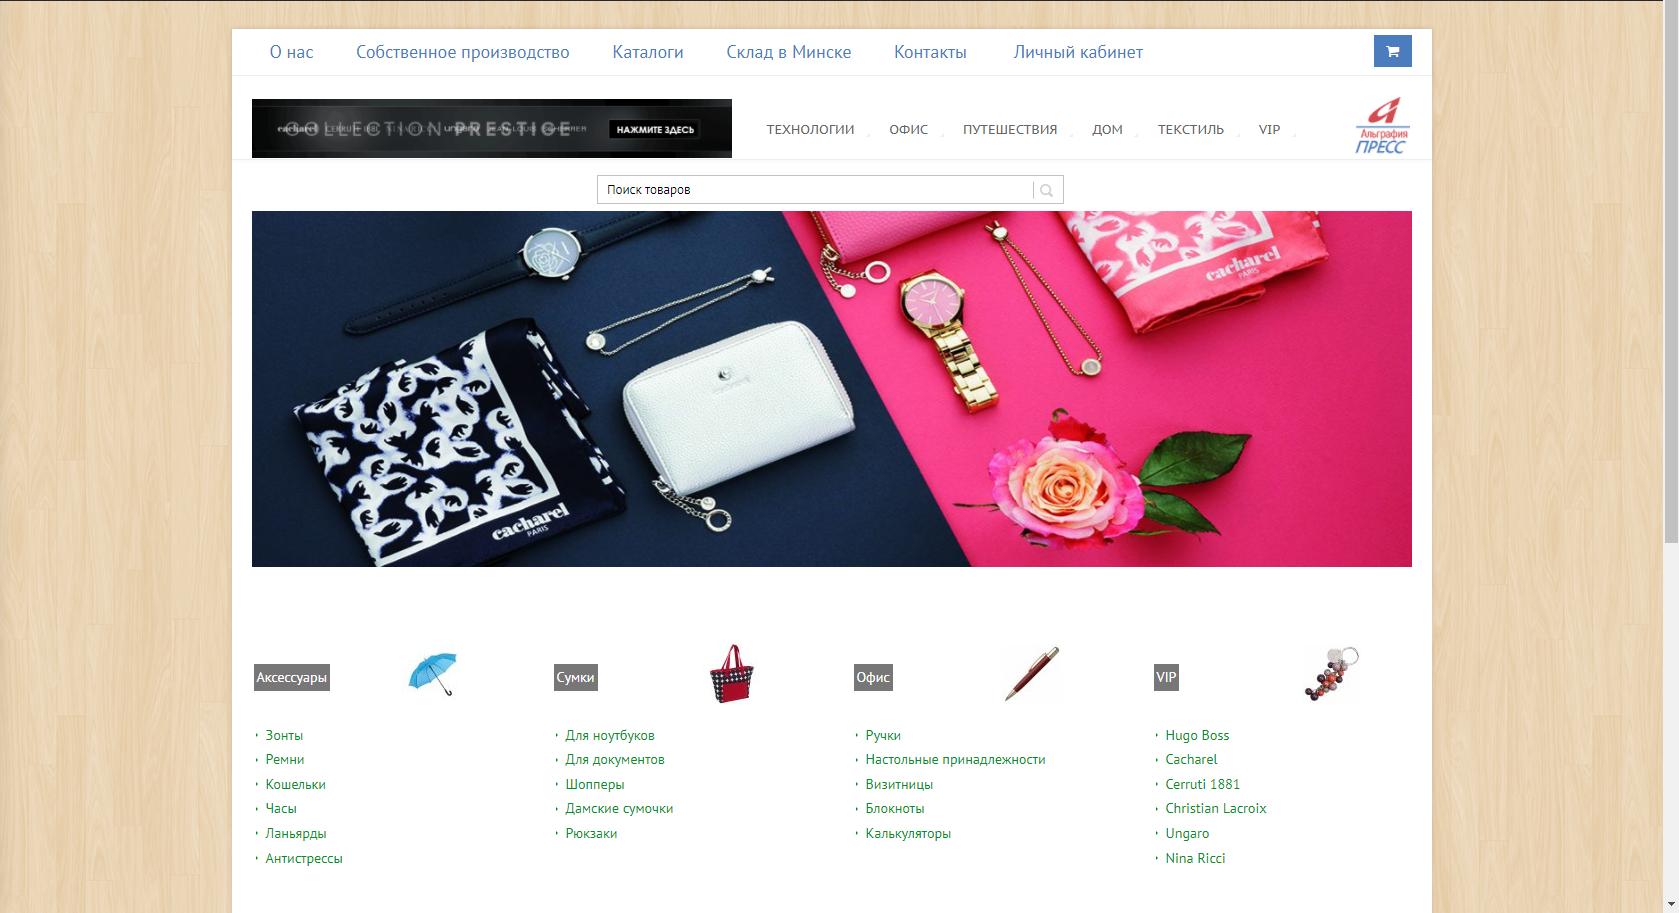 Сайт интернет-магазина tivoli.by